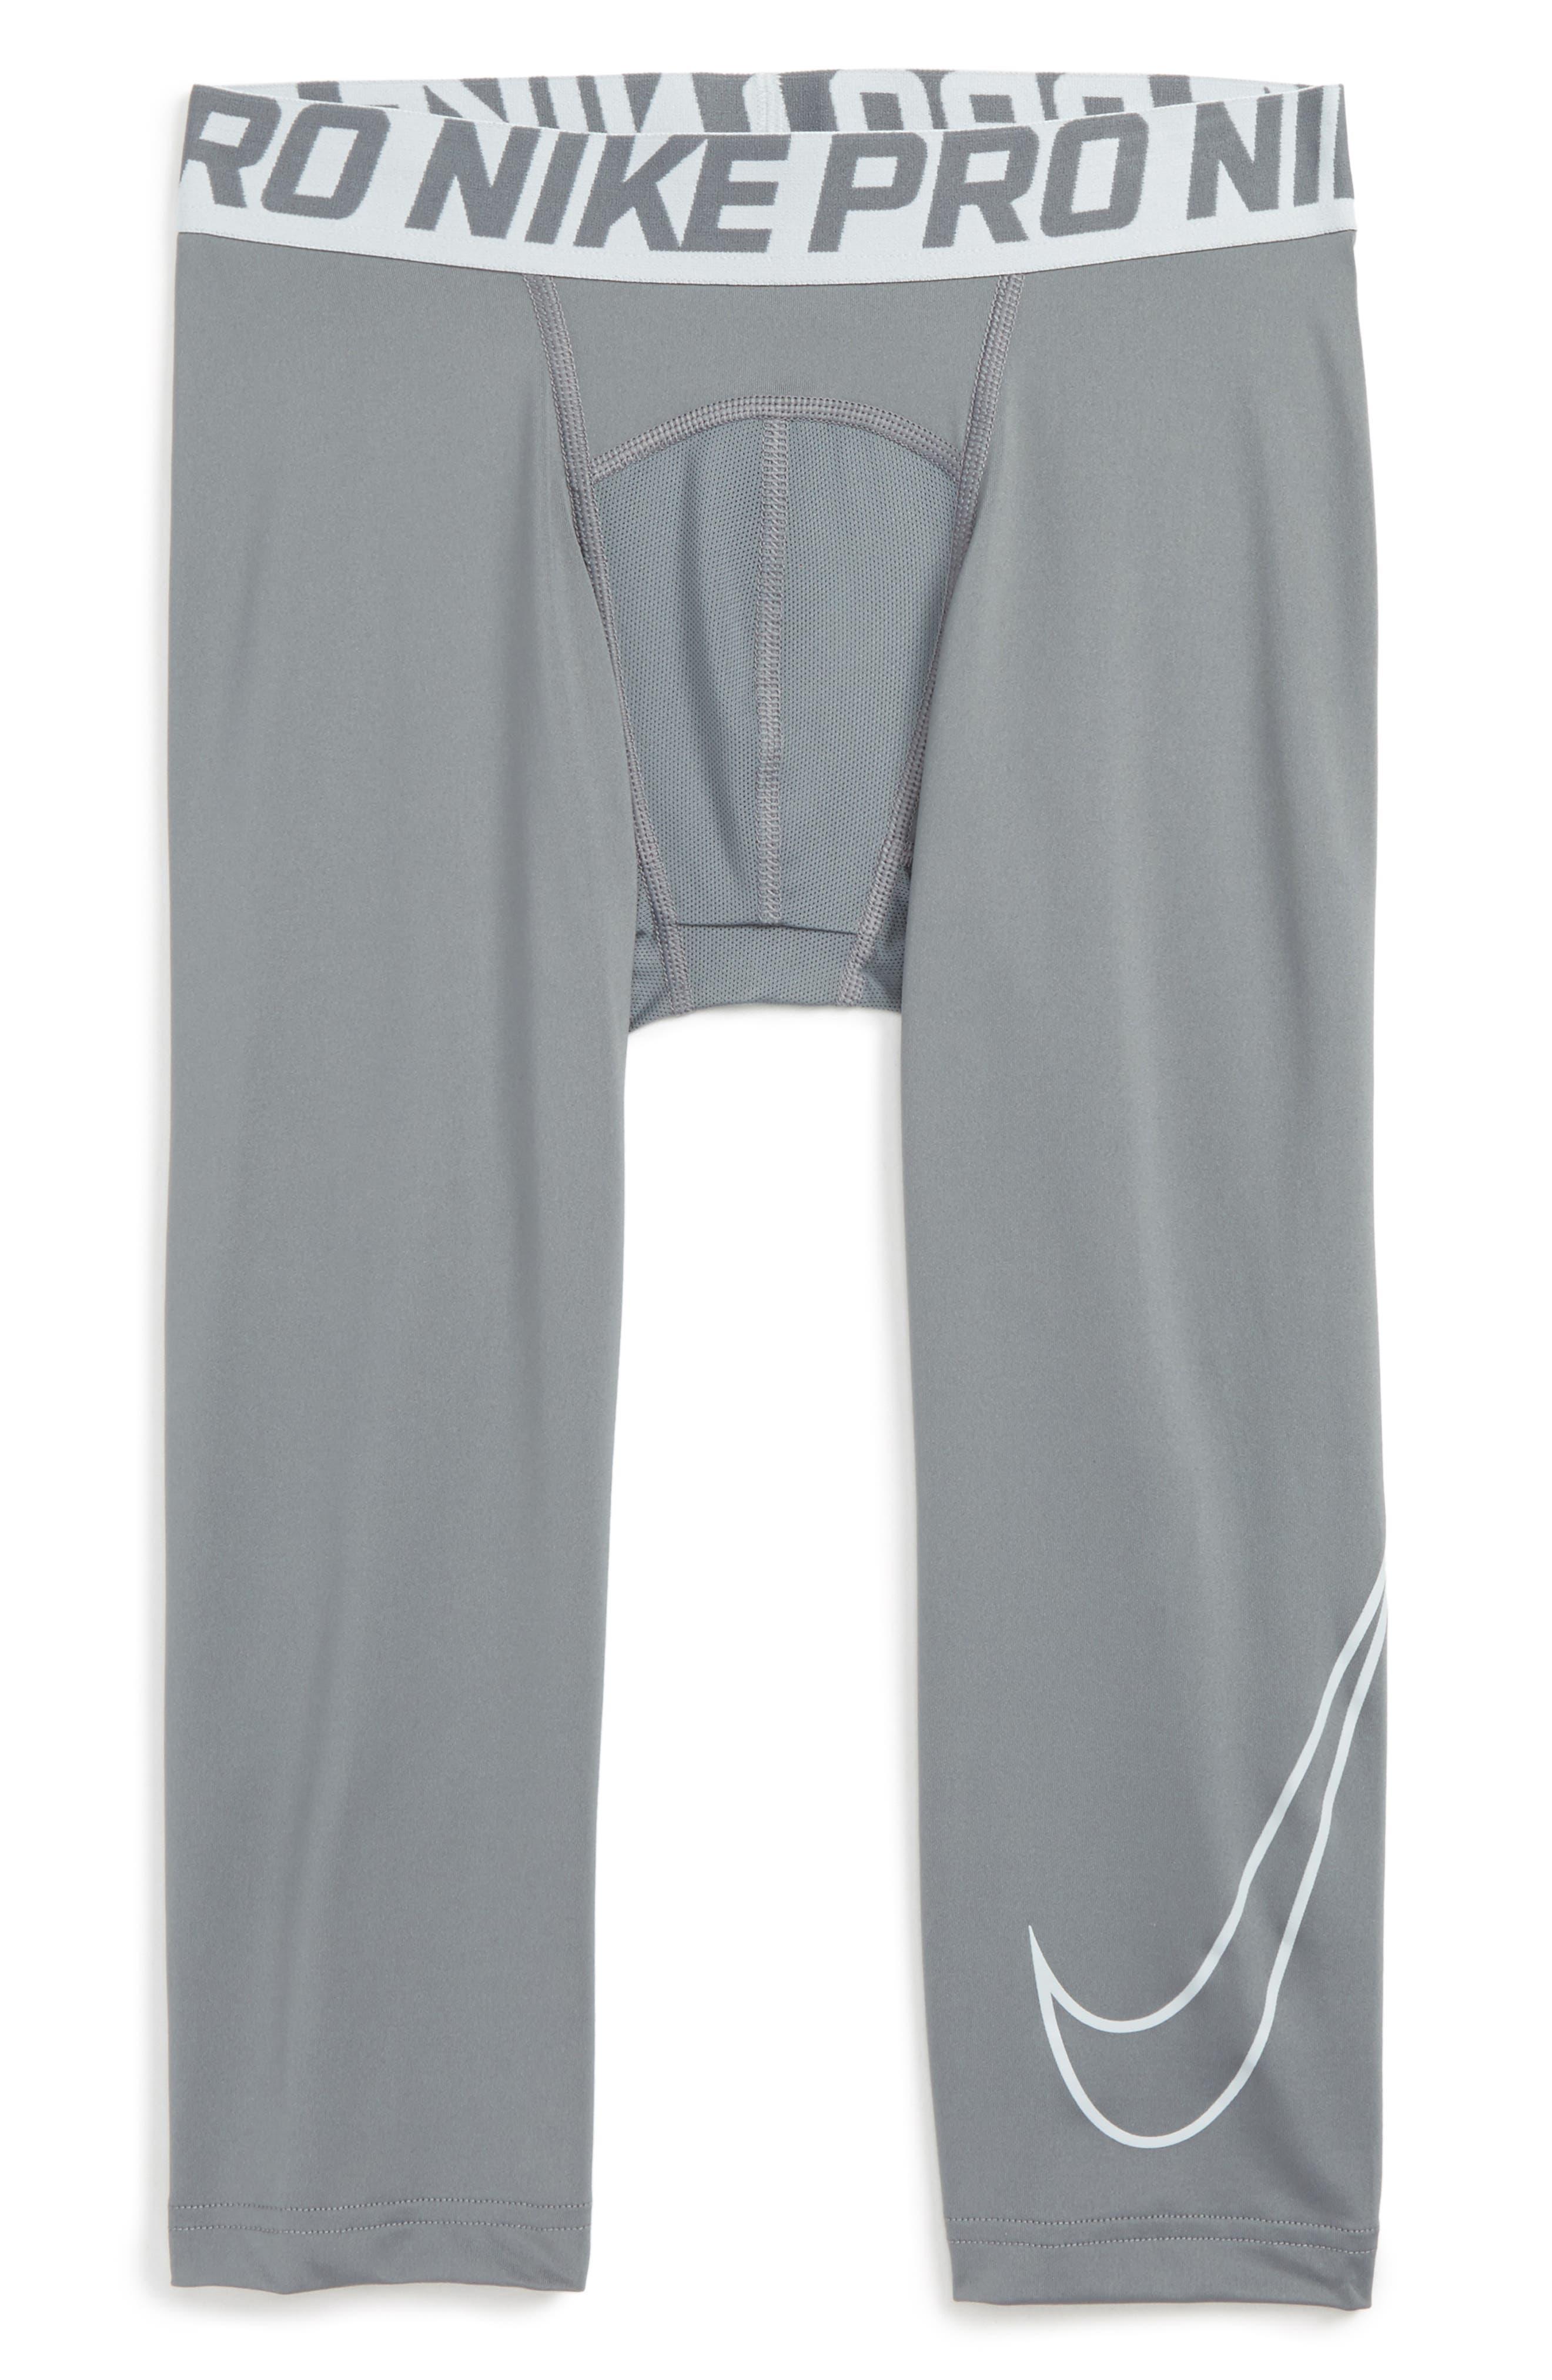 Main Image - Nike ProCool Compression HBR Sport Tights (Little Boys & Big Boys)